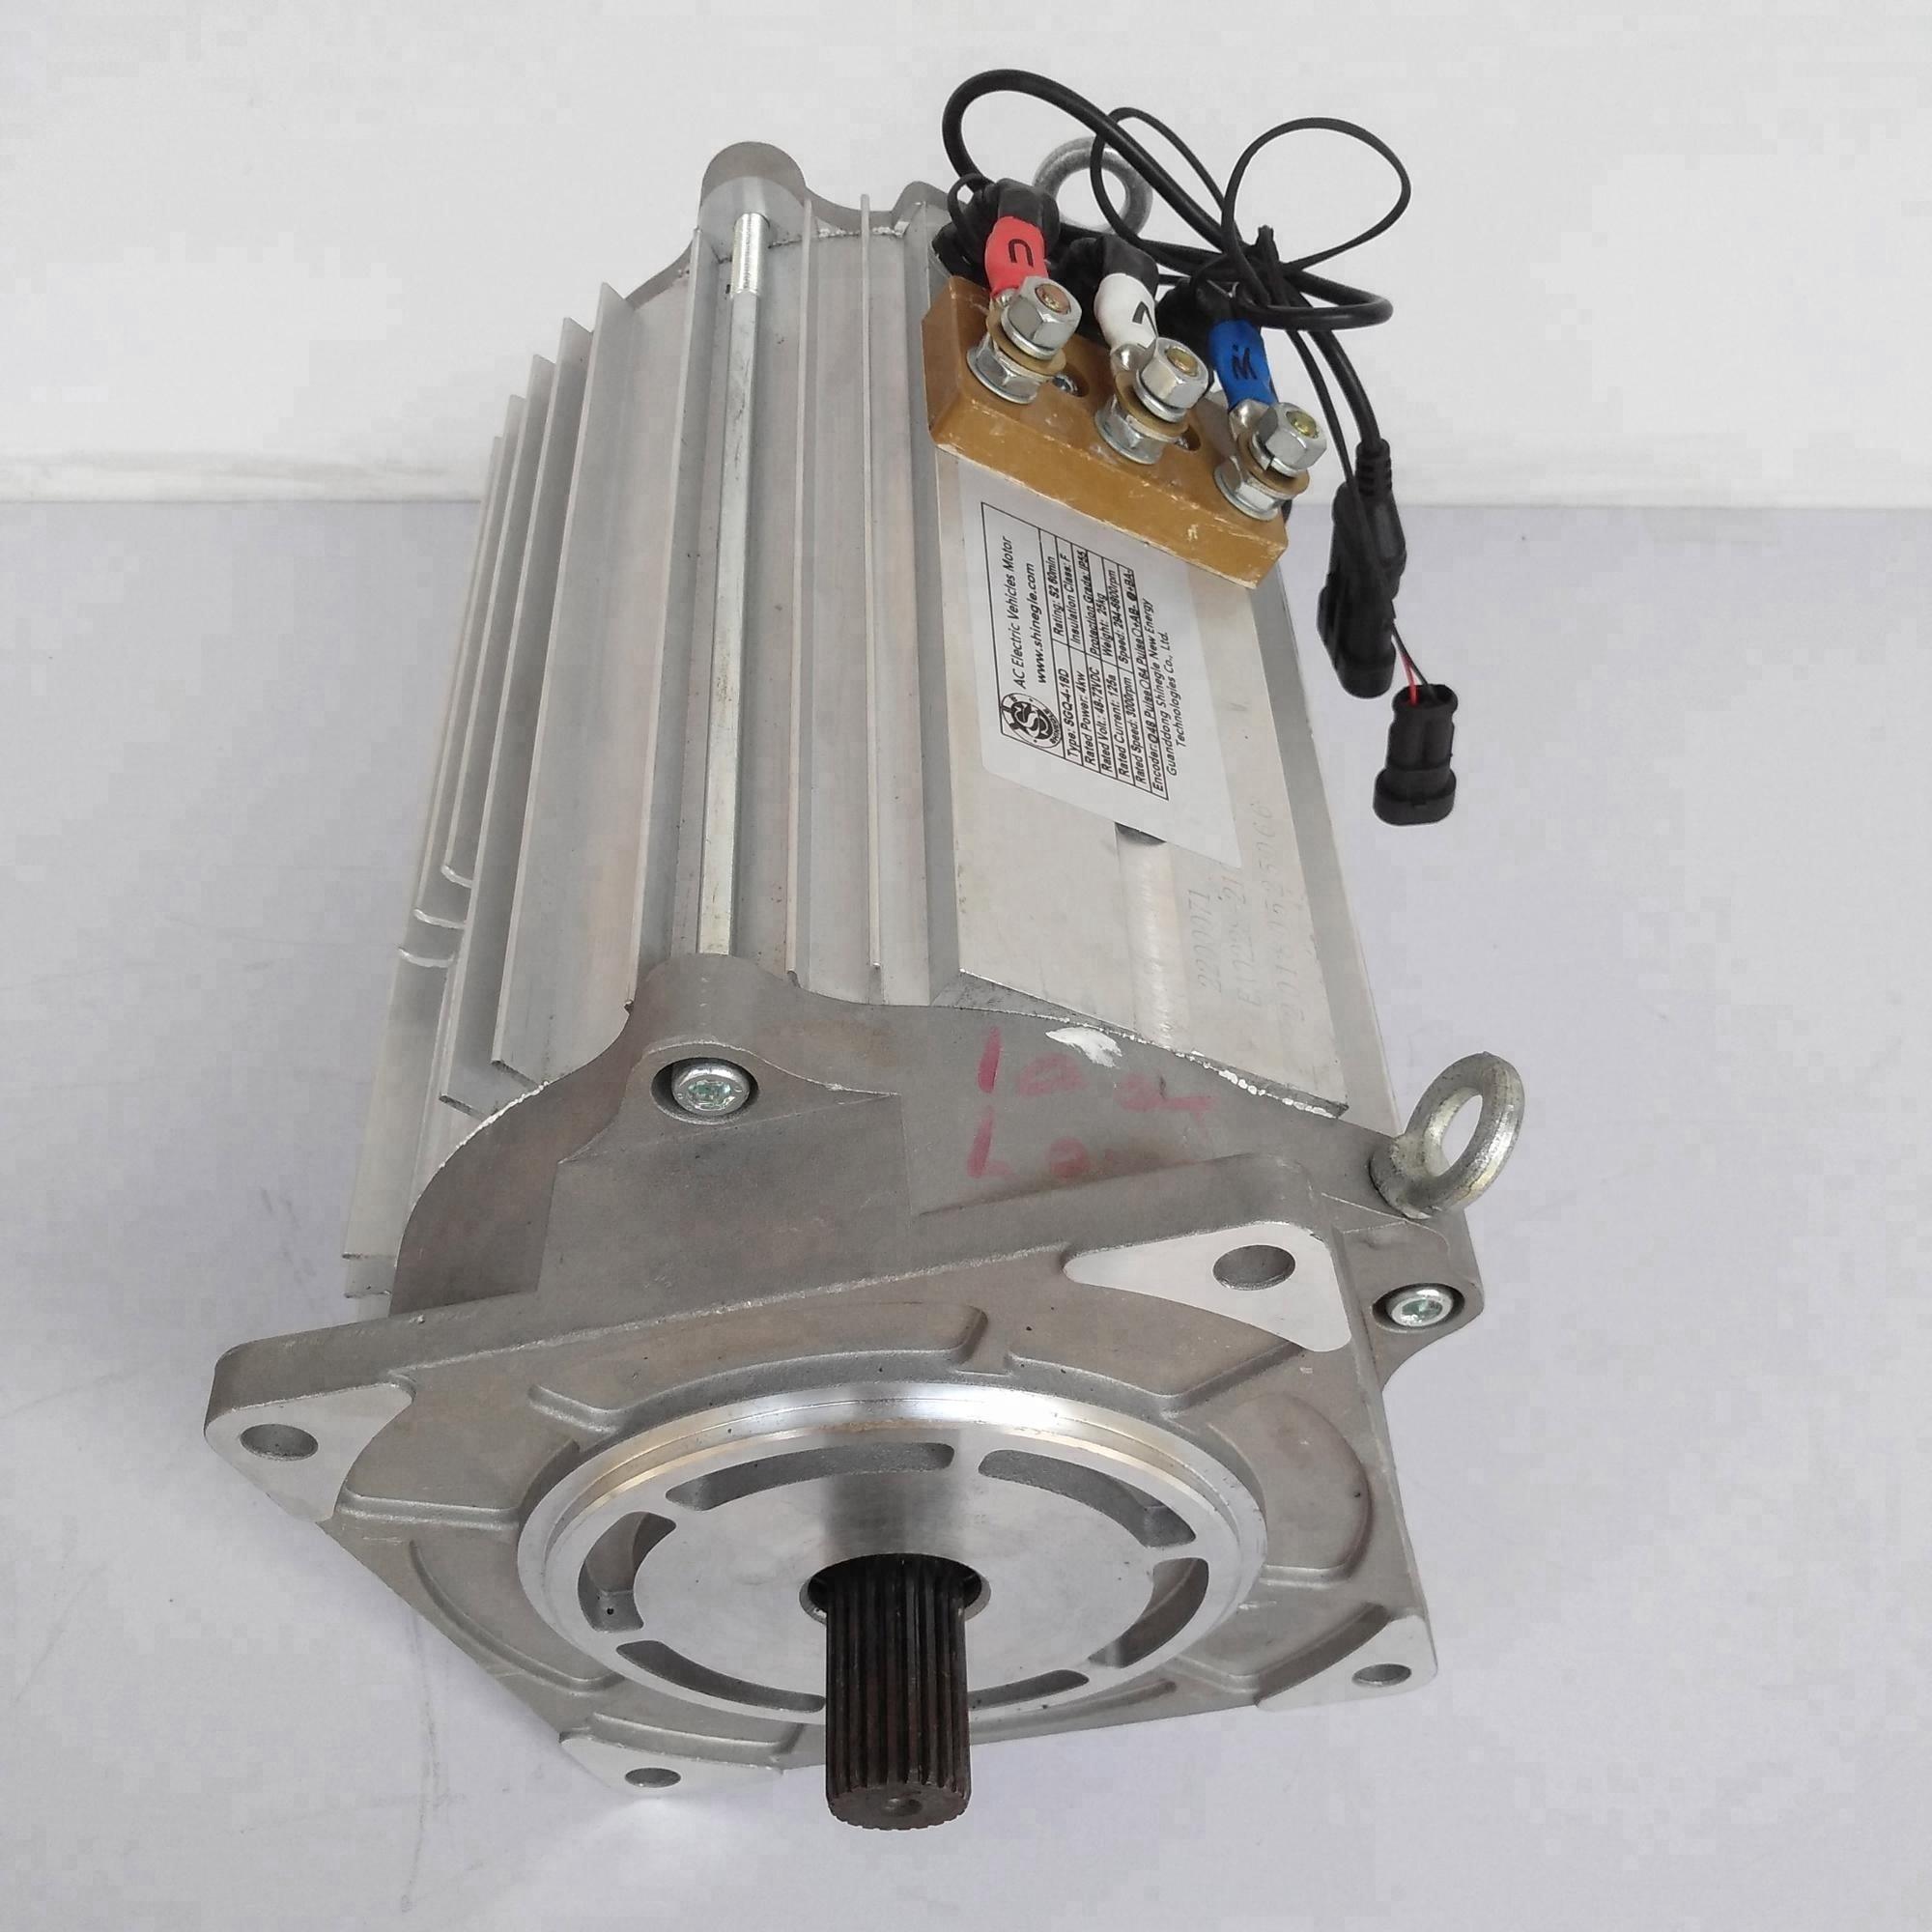 Induction Motor 7.5kw Tesla Motors Electric Car AC Motor And Controller Ev Conversion Kit For Car